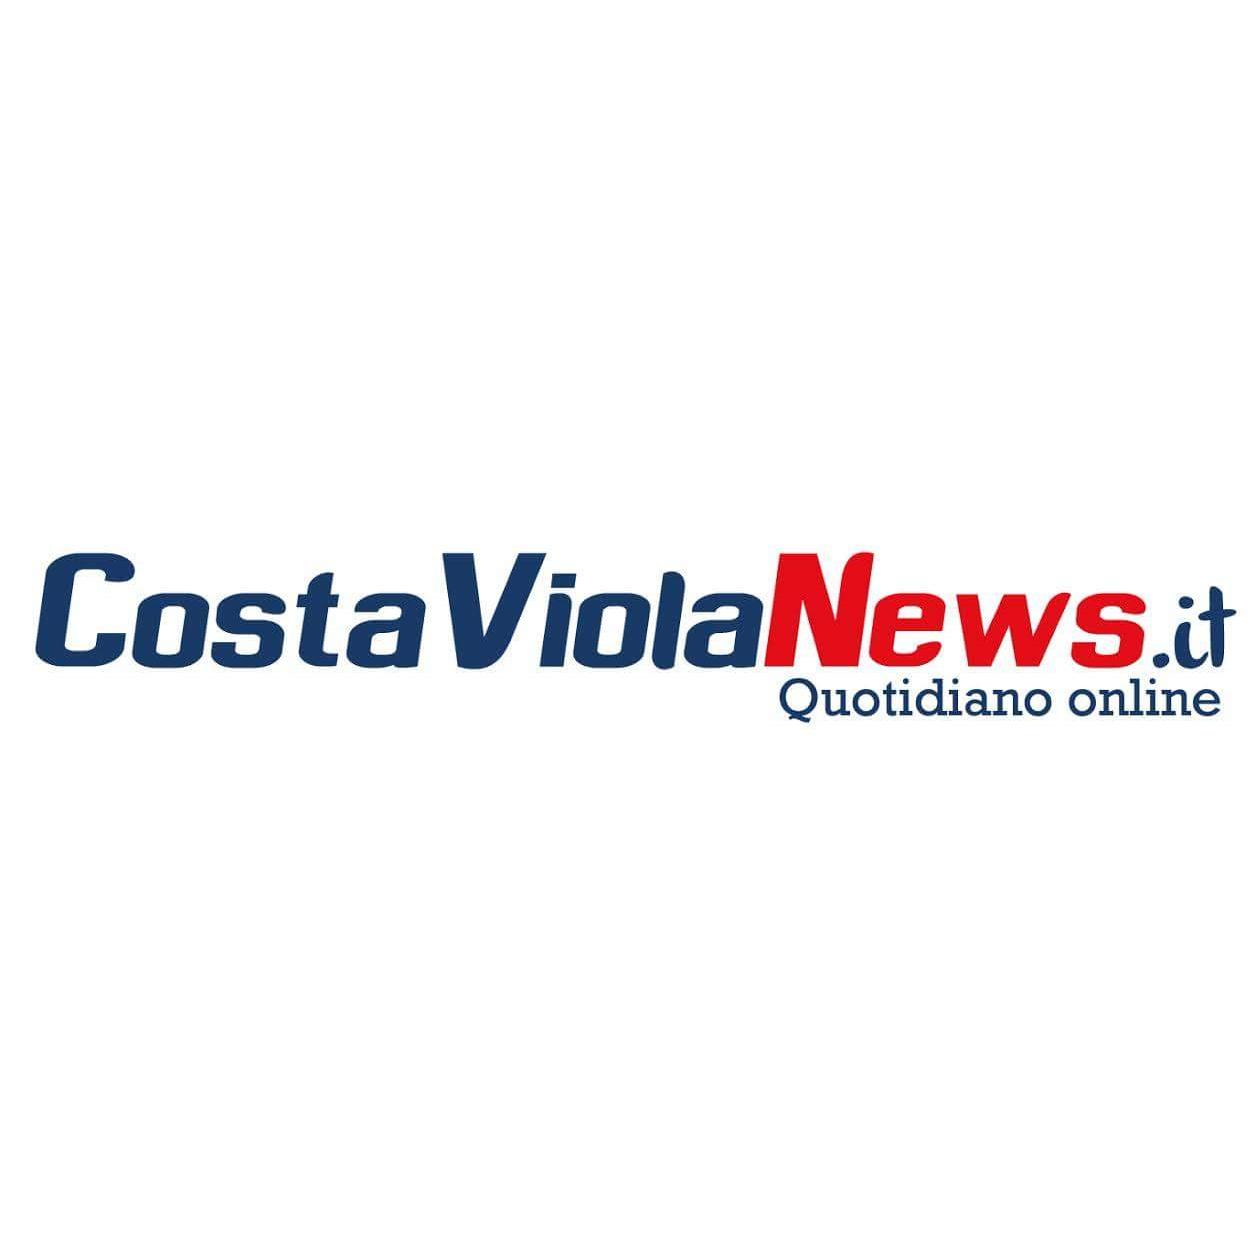 CostaViolaNews.it